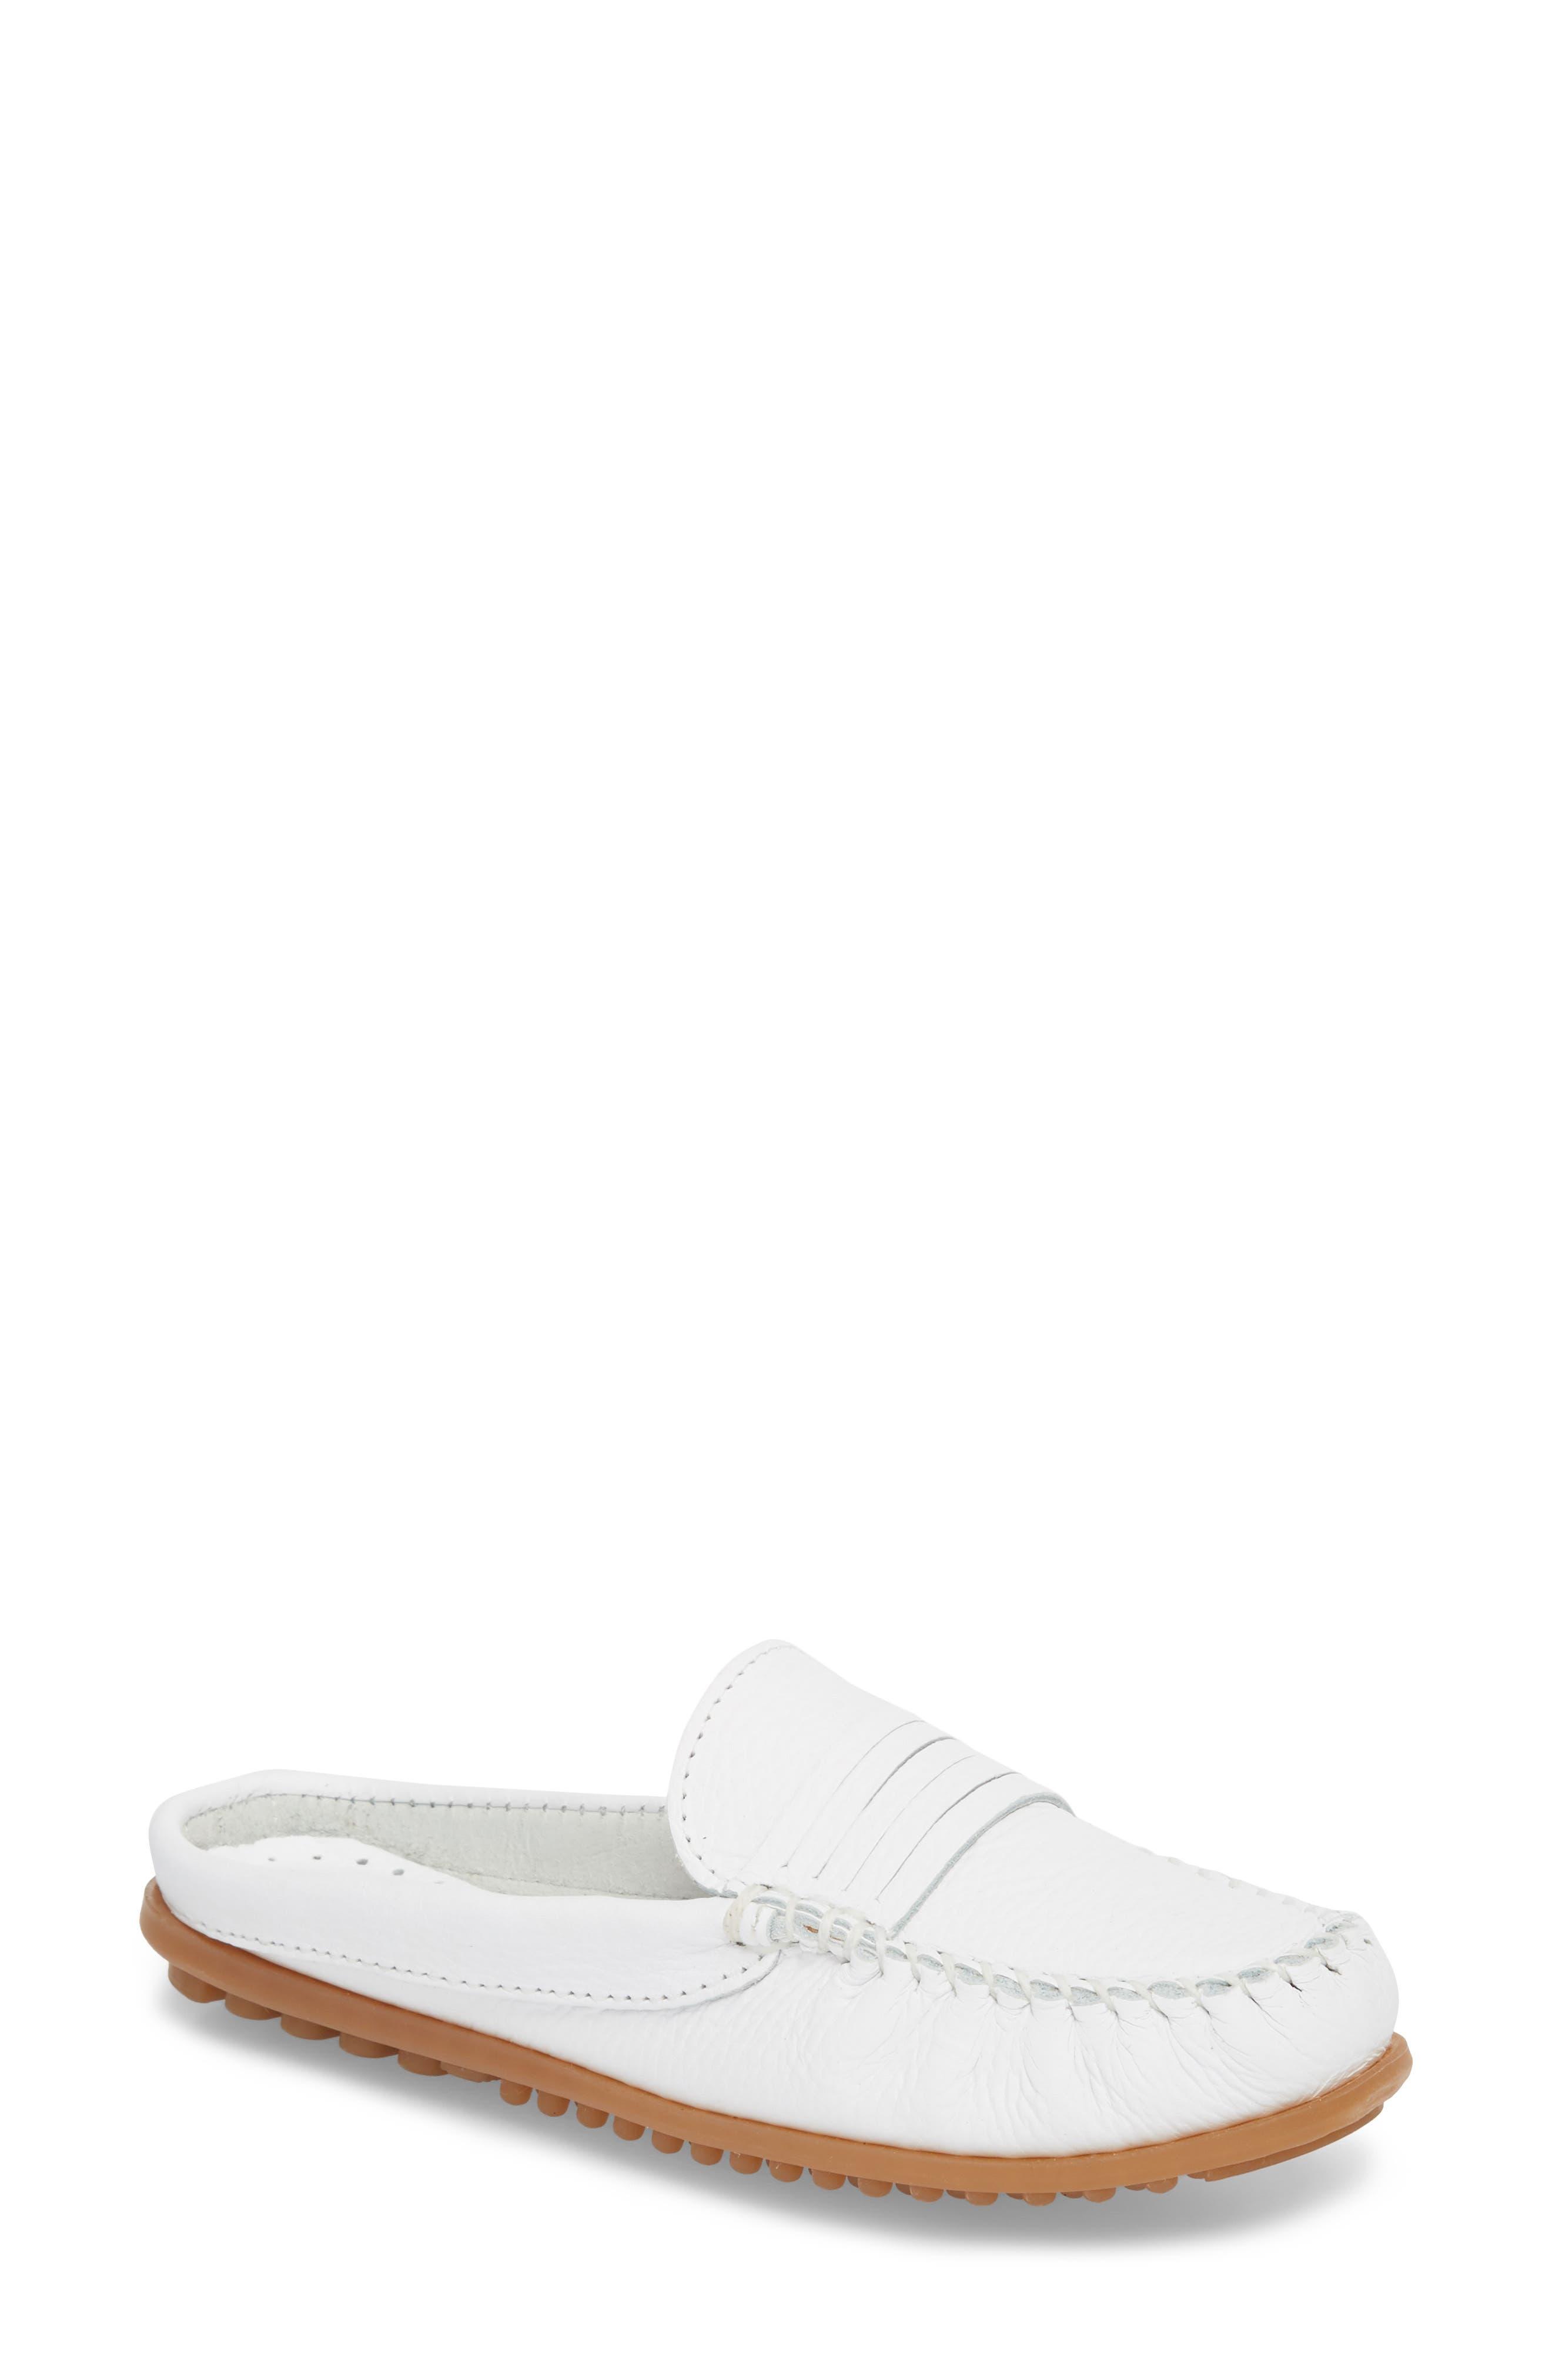 Minnetonka Kate Moc Toe Loafer Mule, White